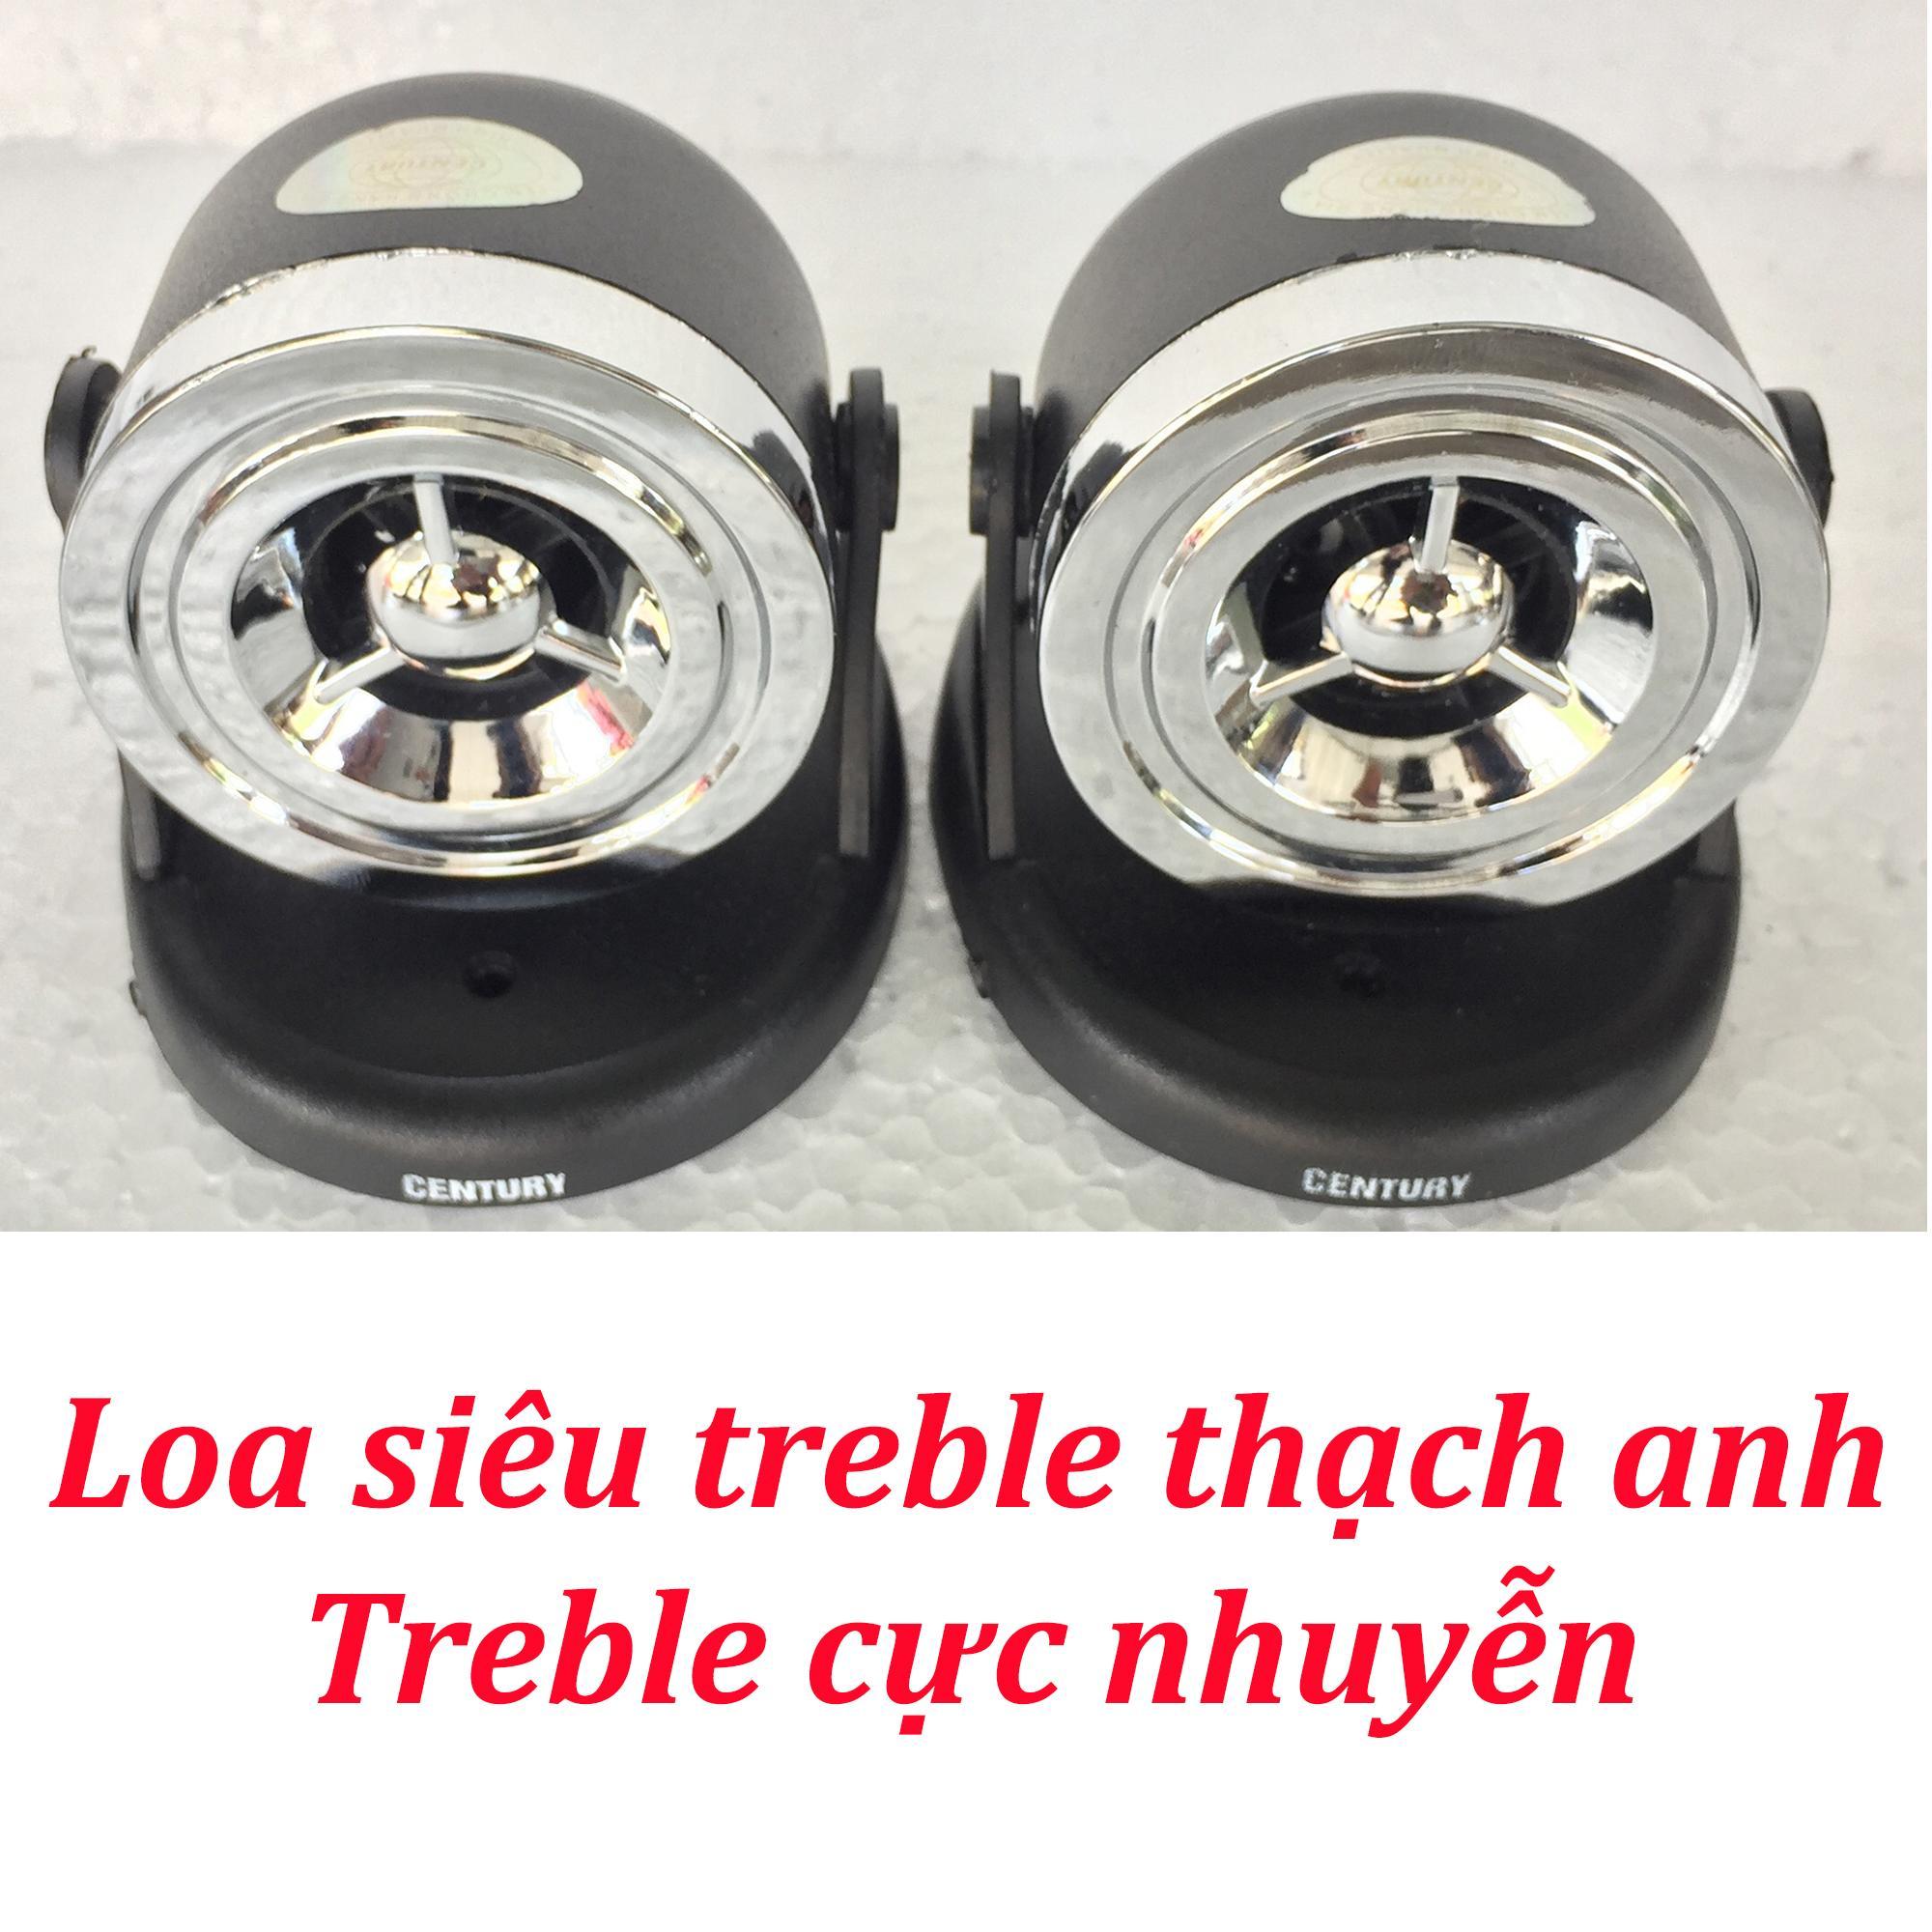 Hình ảnh Loa treble rời Bộ 2 Loa siêu treble E90 bổ sung treble cho loa thiếu treble cực hay